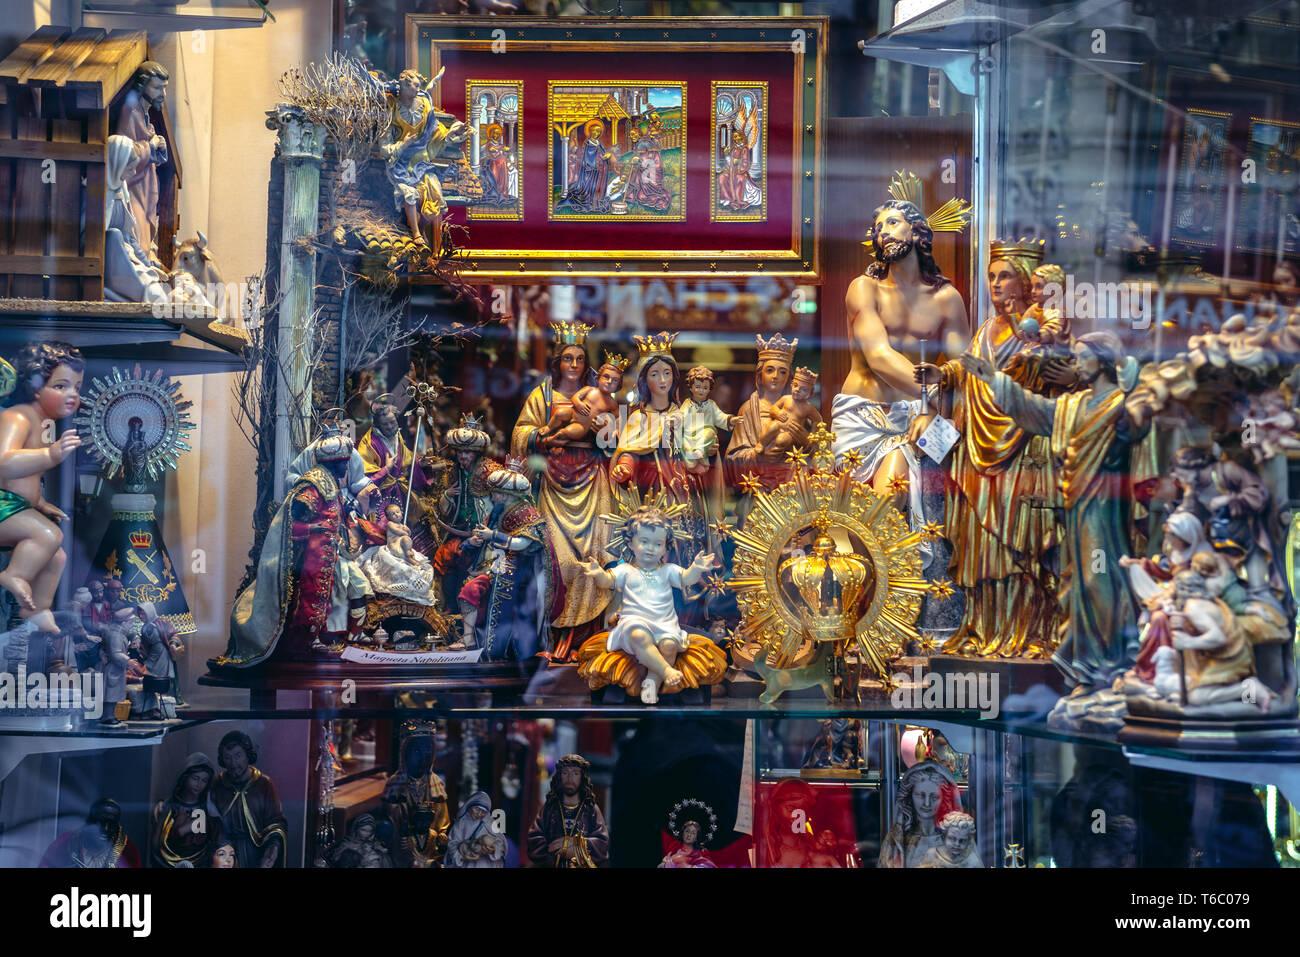 Sobrinos De Perez El Angel - The Angel Perez Nephews devotional articles shop on Calle de Postas street in Madrid, Spain - Stock Image